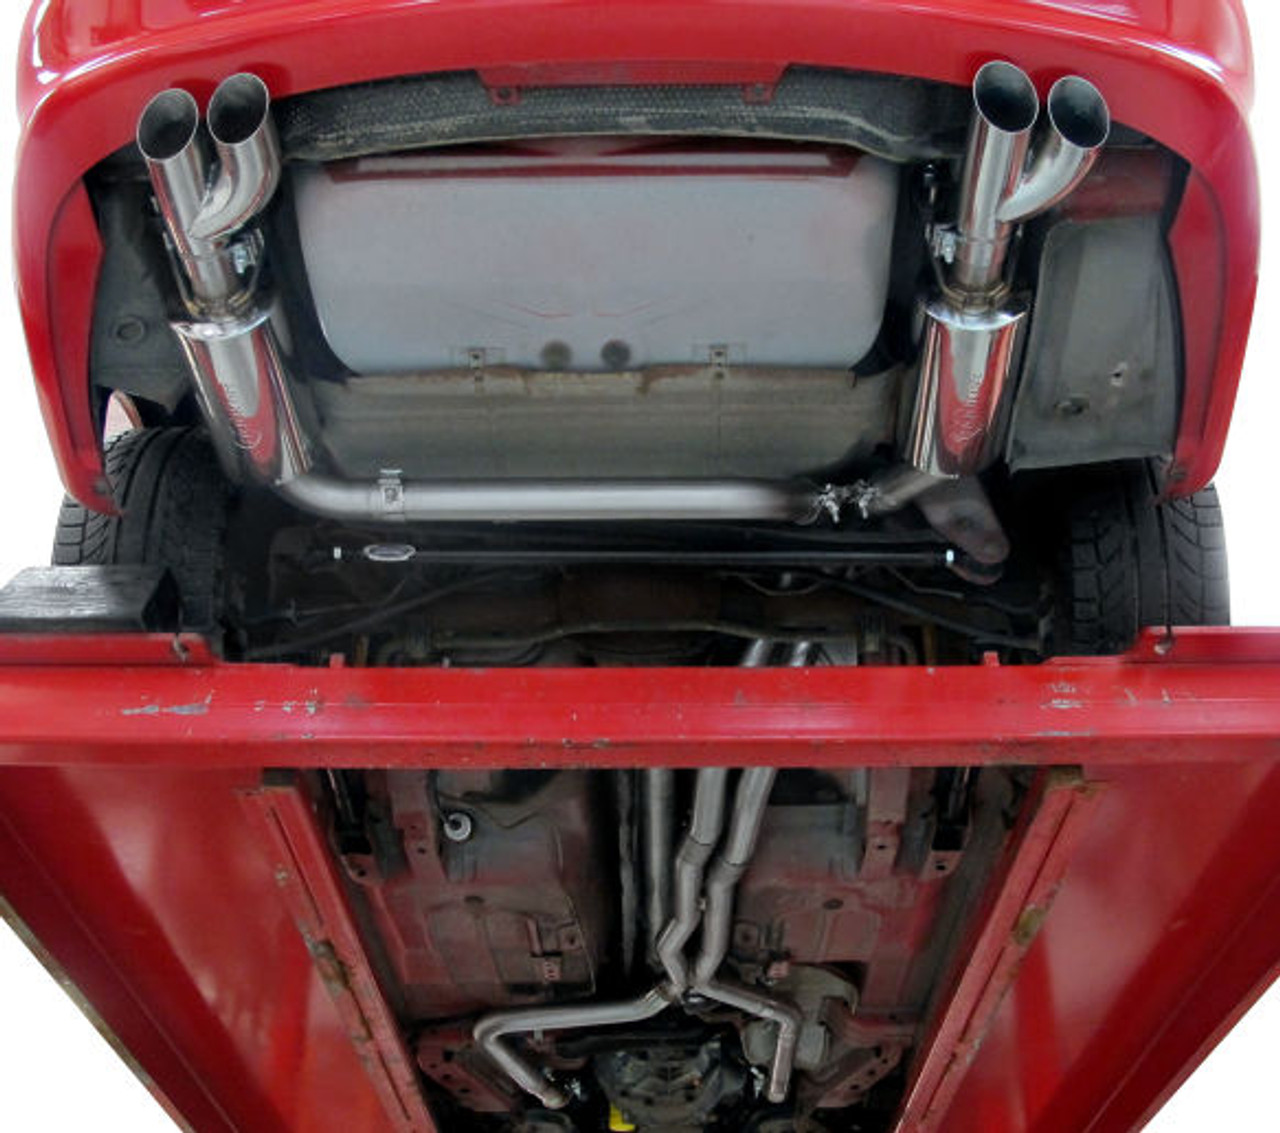 hooker blackheart true dual exhaust kit 5 7l v8 ls engine equipped models 409 stainless steel